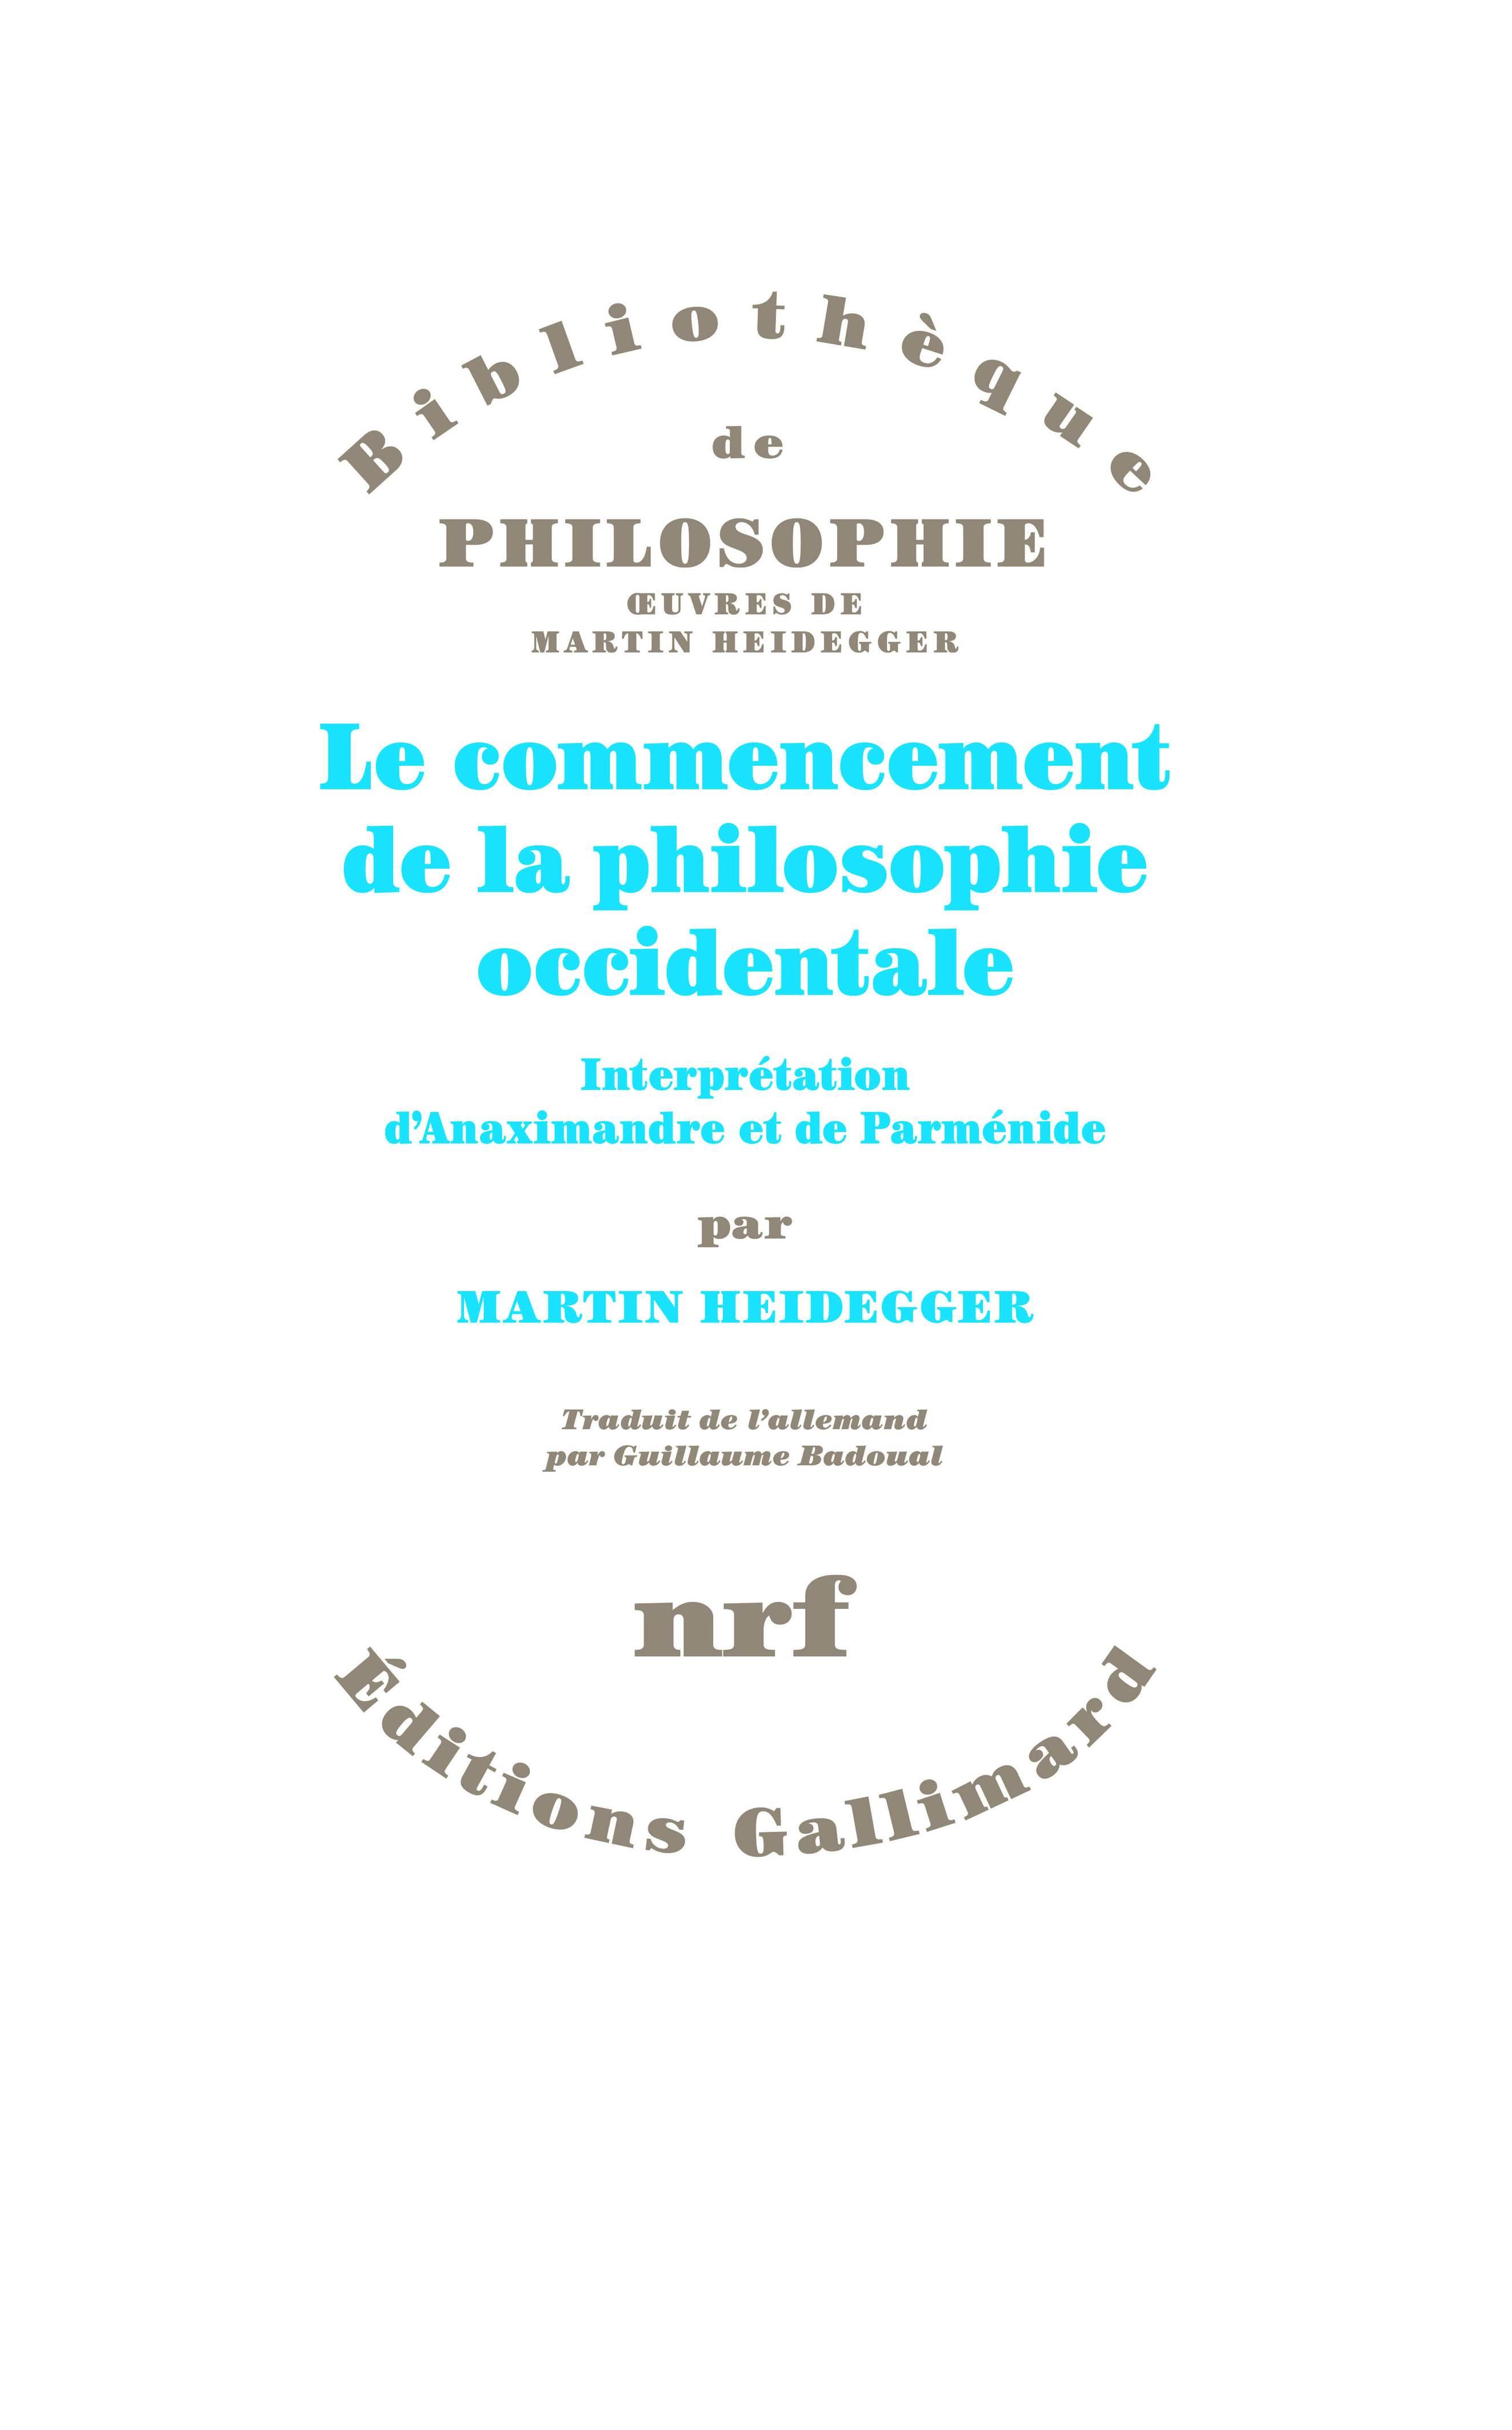 heidegger_le_commencement_de_la_philosophie_occidentale-2.jpg